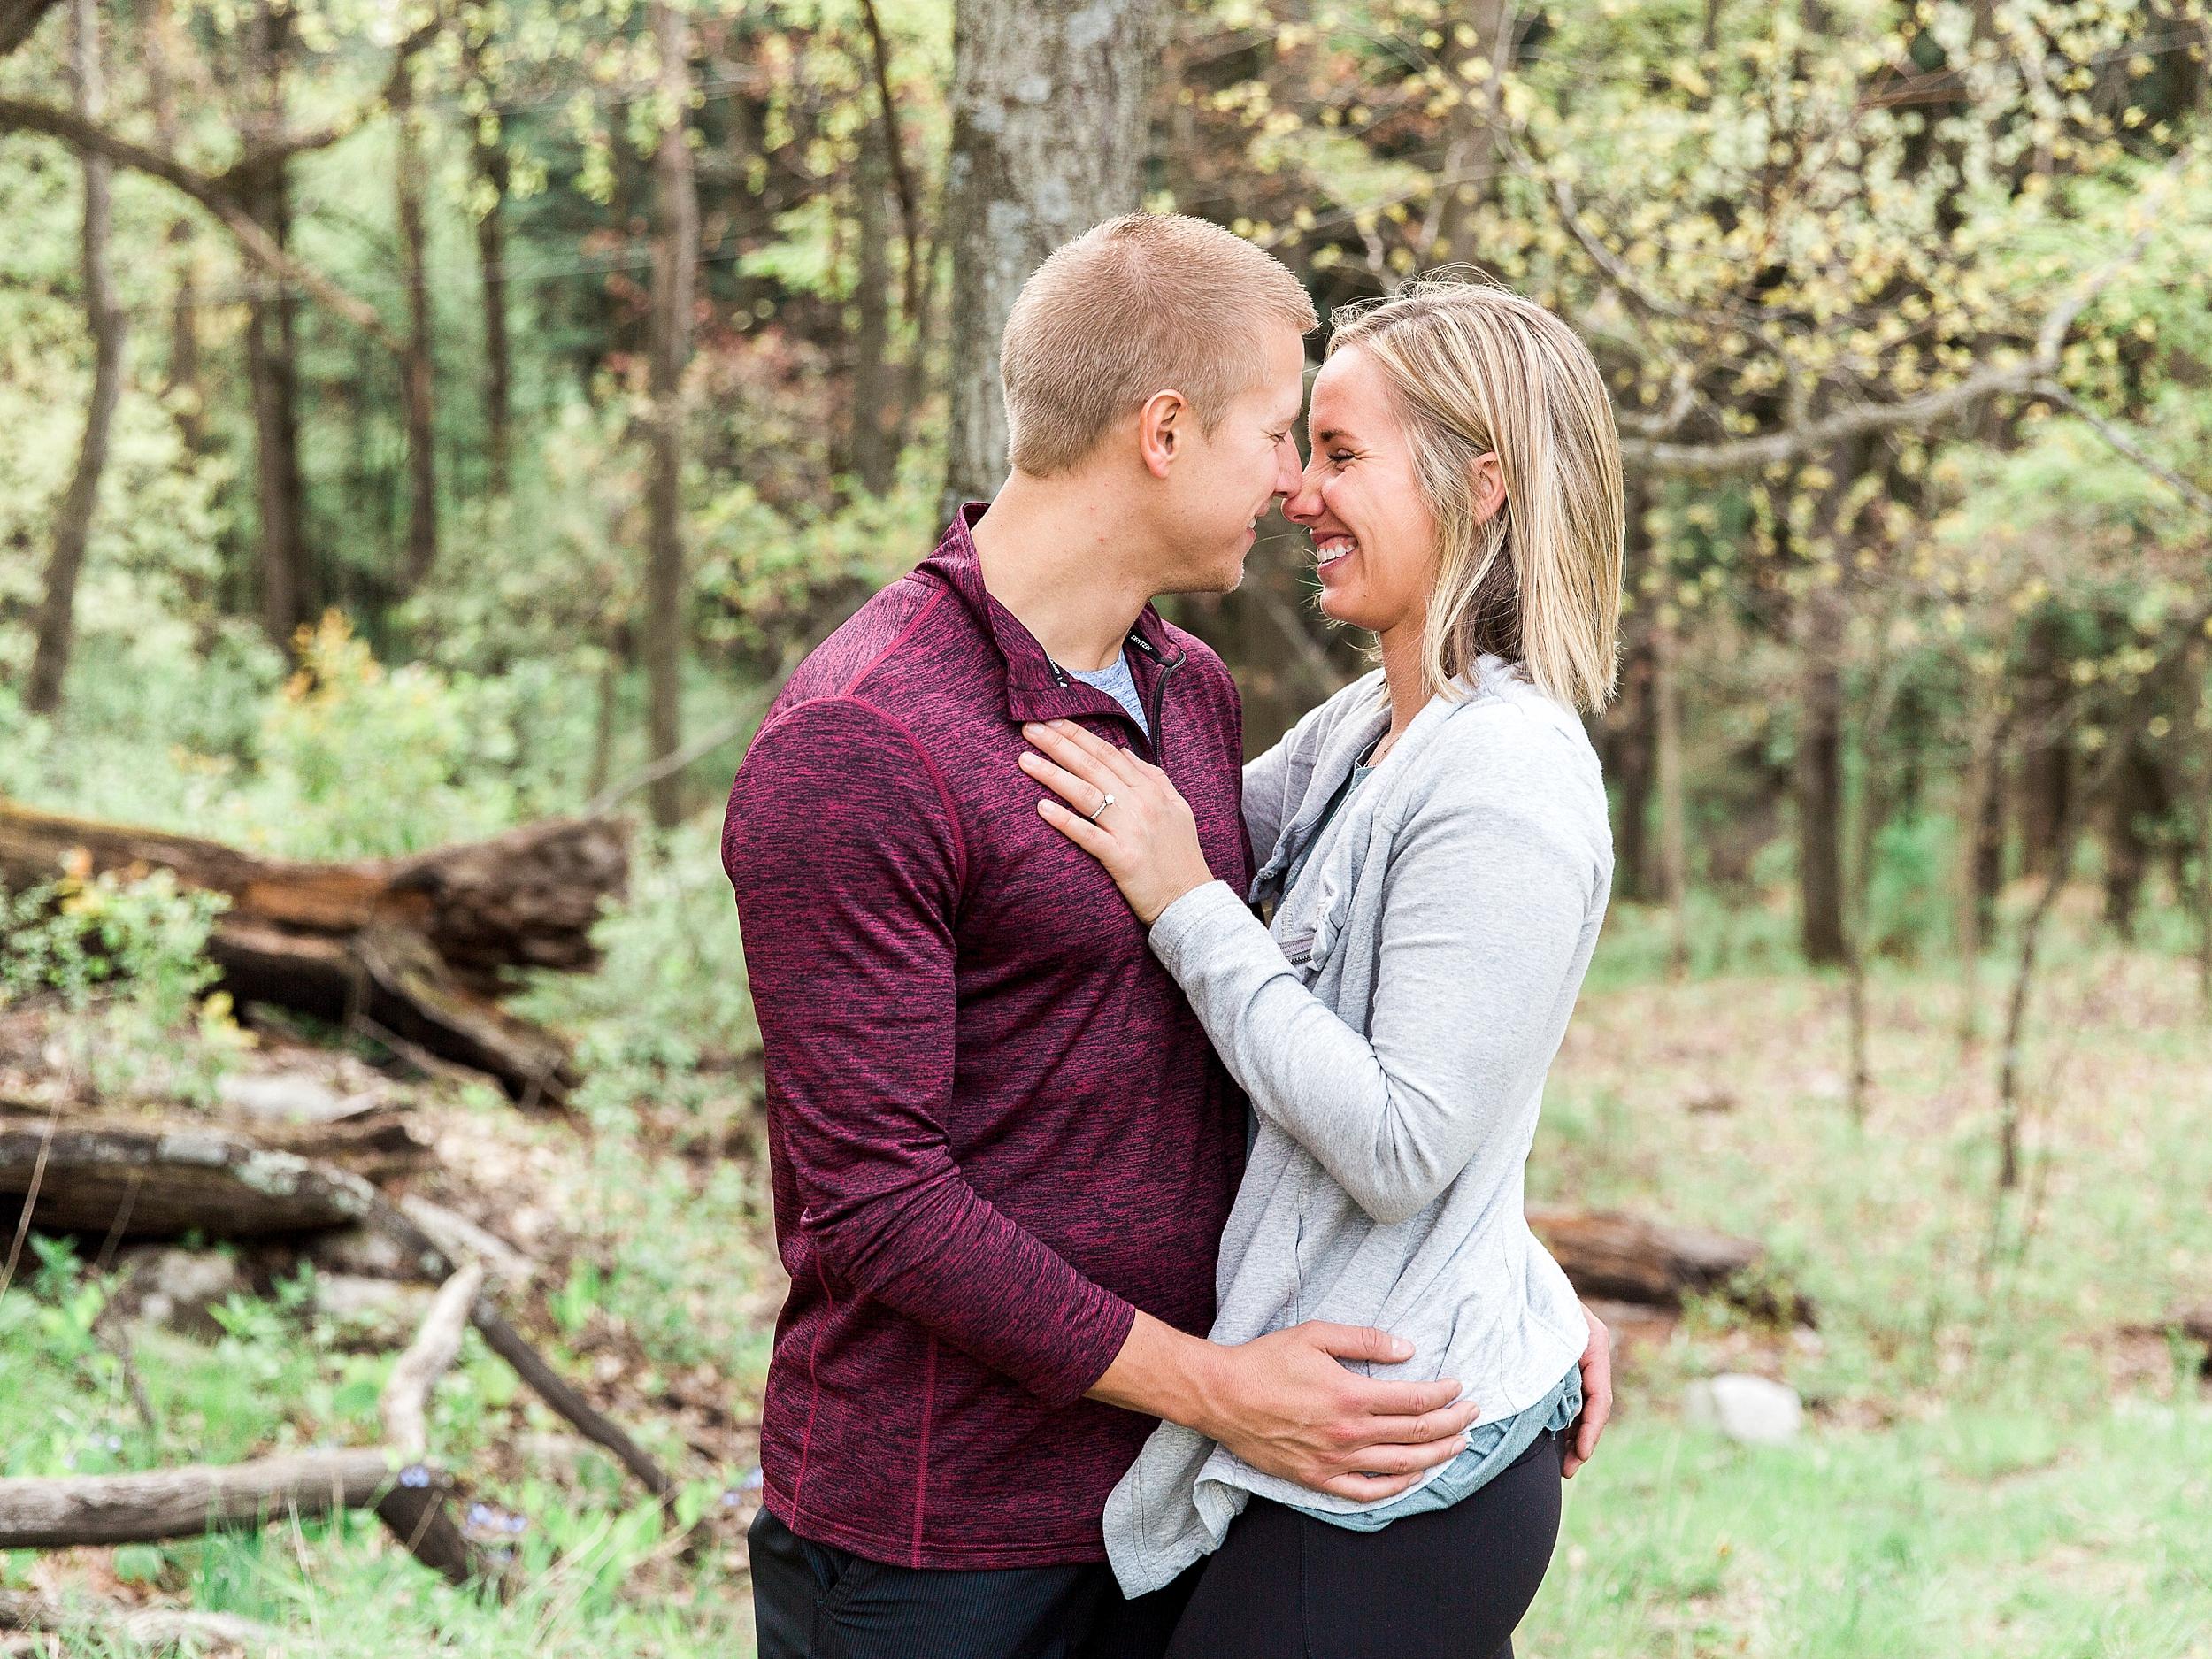 Courtney+Kyle_Proposal_HaleyKingCo_95_web.jpg